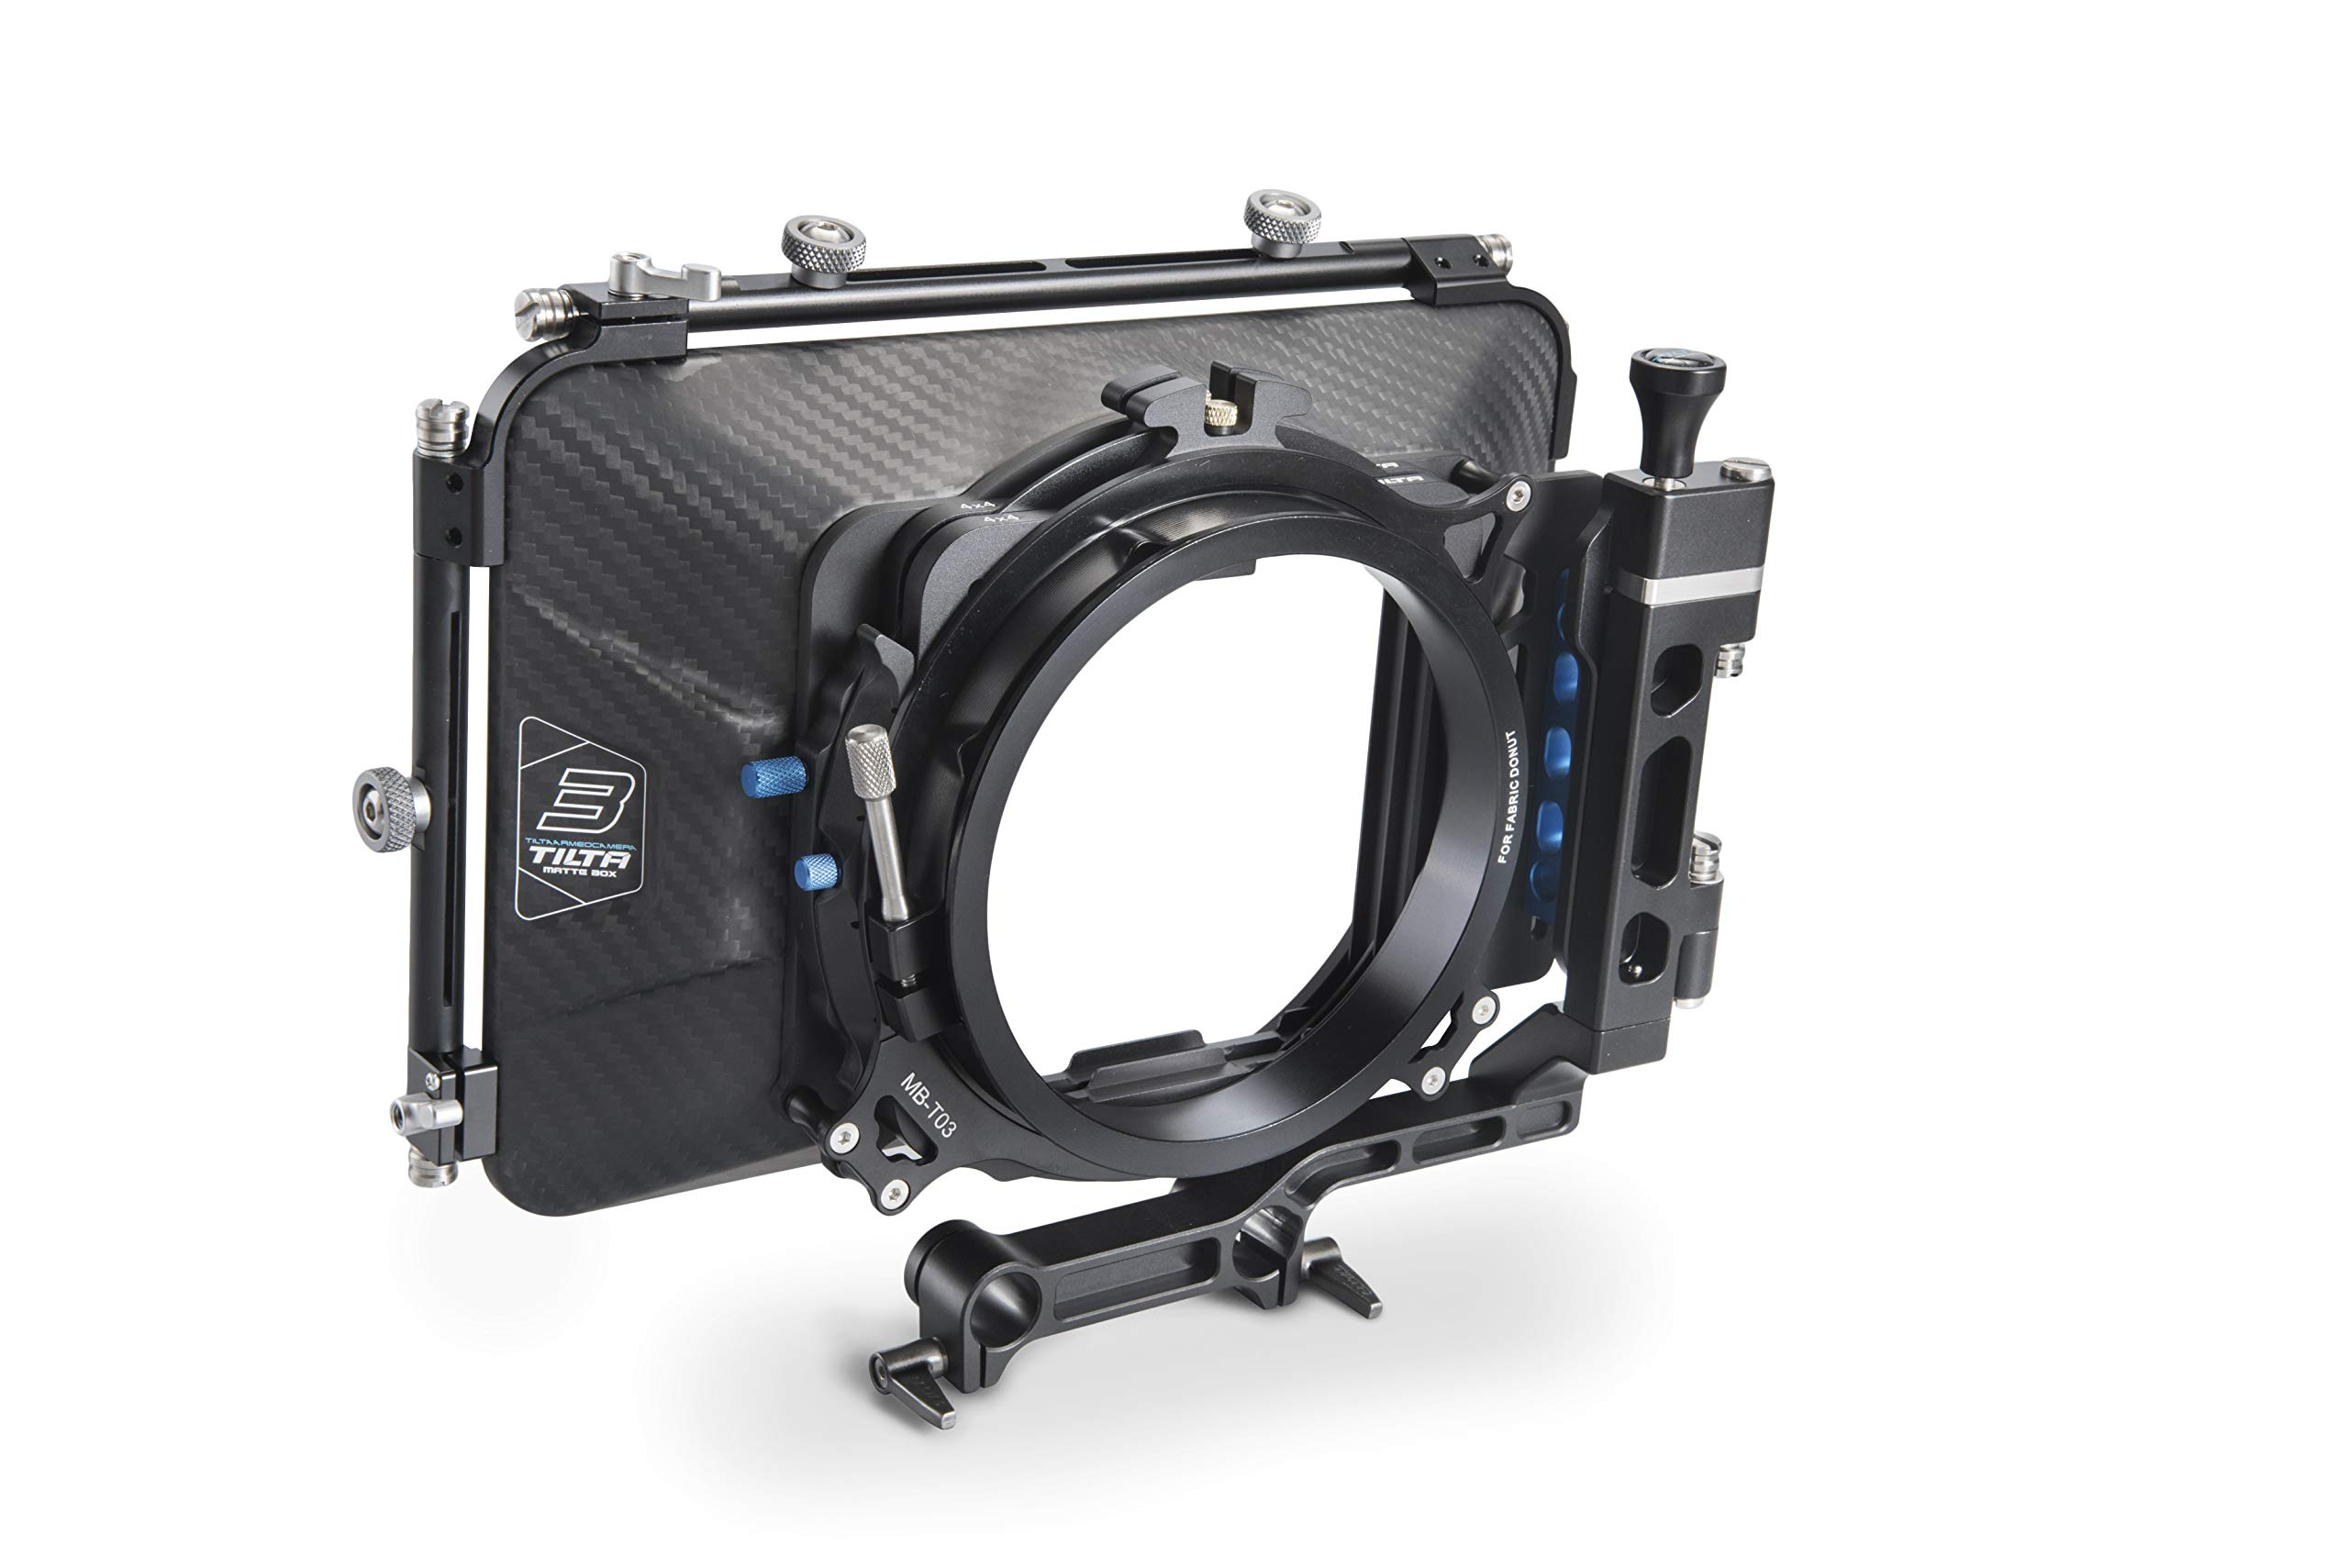 TILTA MB-T03 4×4 Carbon Fiber Matte Box MB-T03,4×4 Carbon Fiber Matte Box for 15mm Rod Support Rig DSLR HDV 5D3 D800 C300 BMCC by Tilta